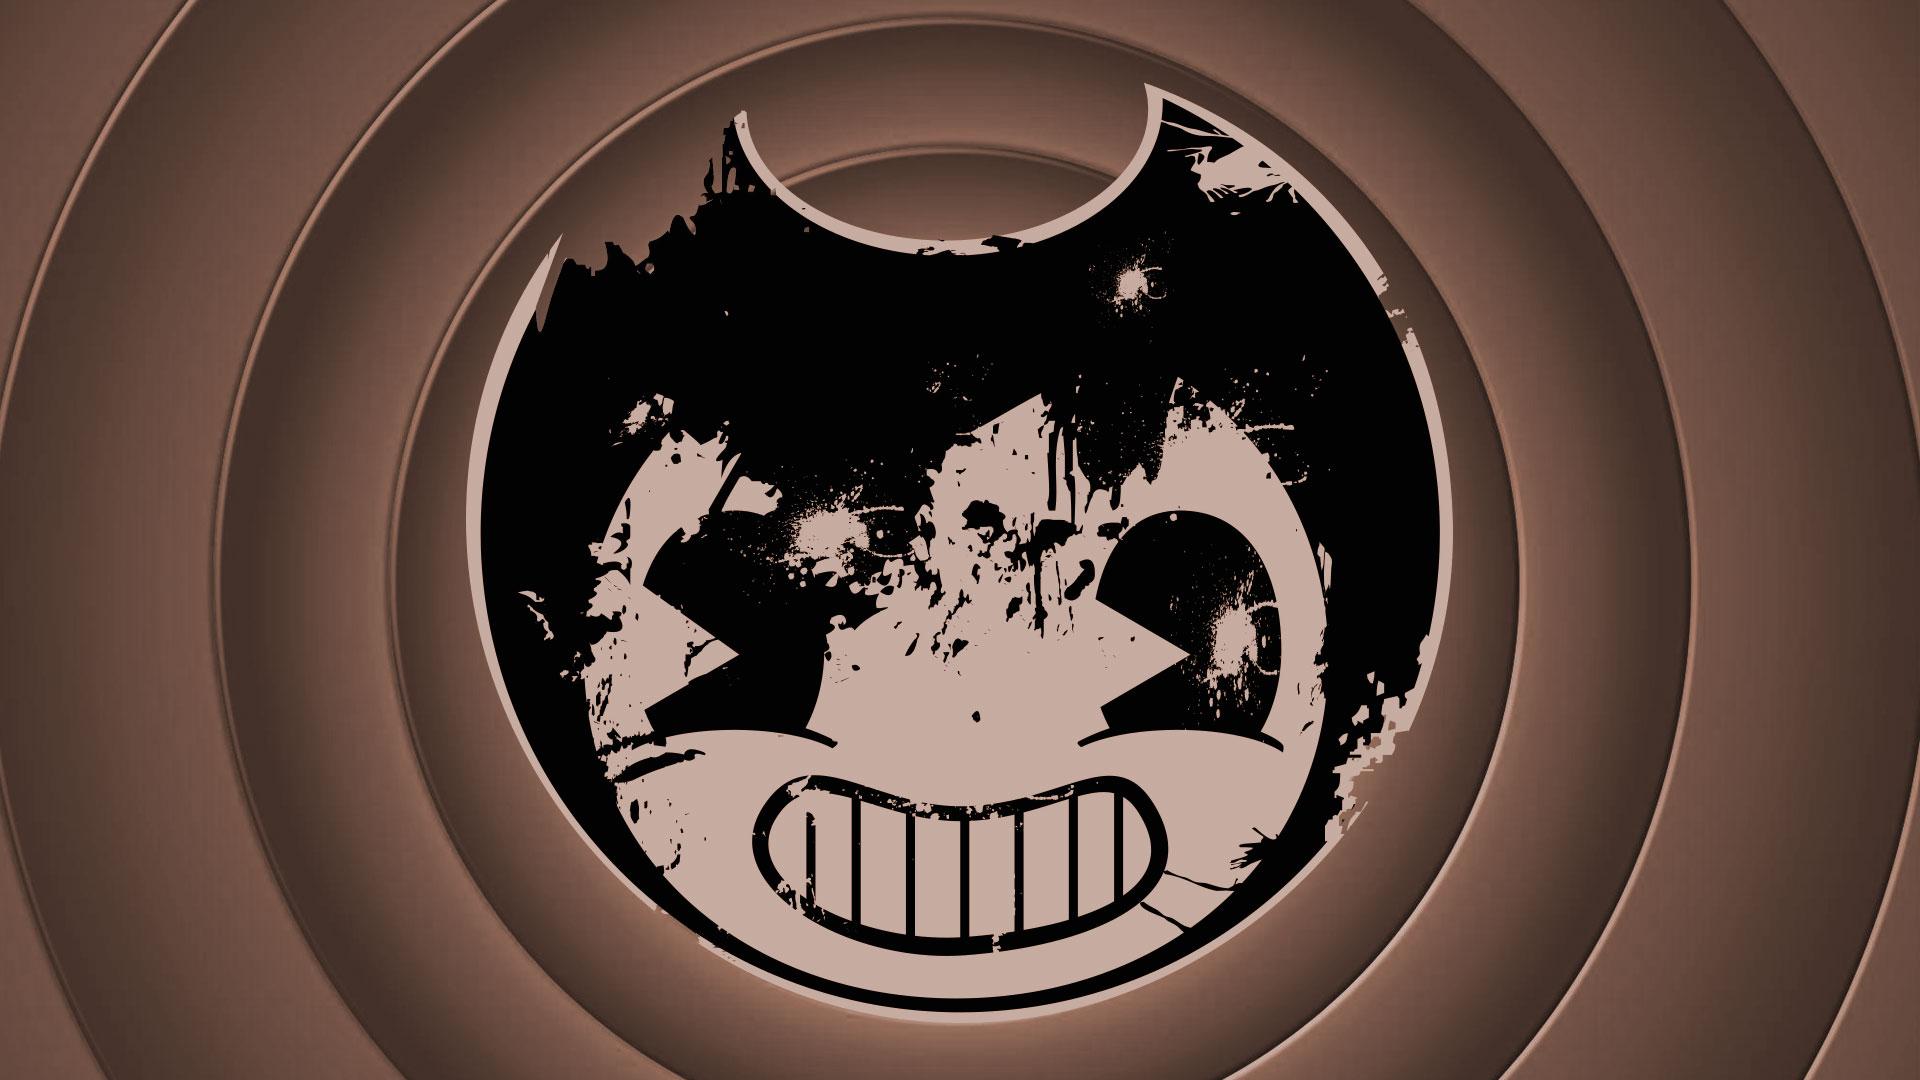 Bendy and the Ink Machine Gameplay Videos | Indie Horror Gameplay Videos